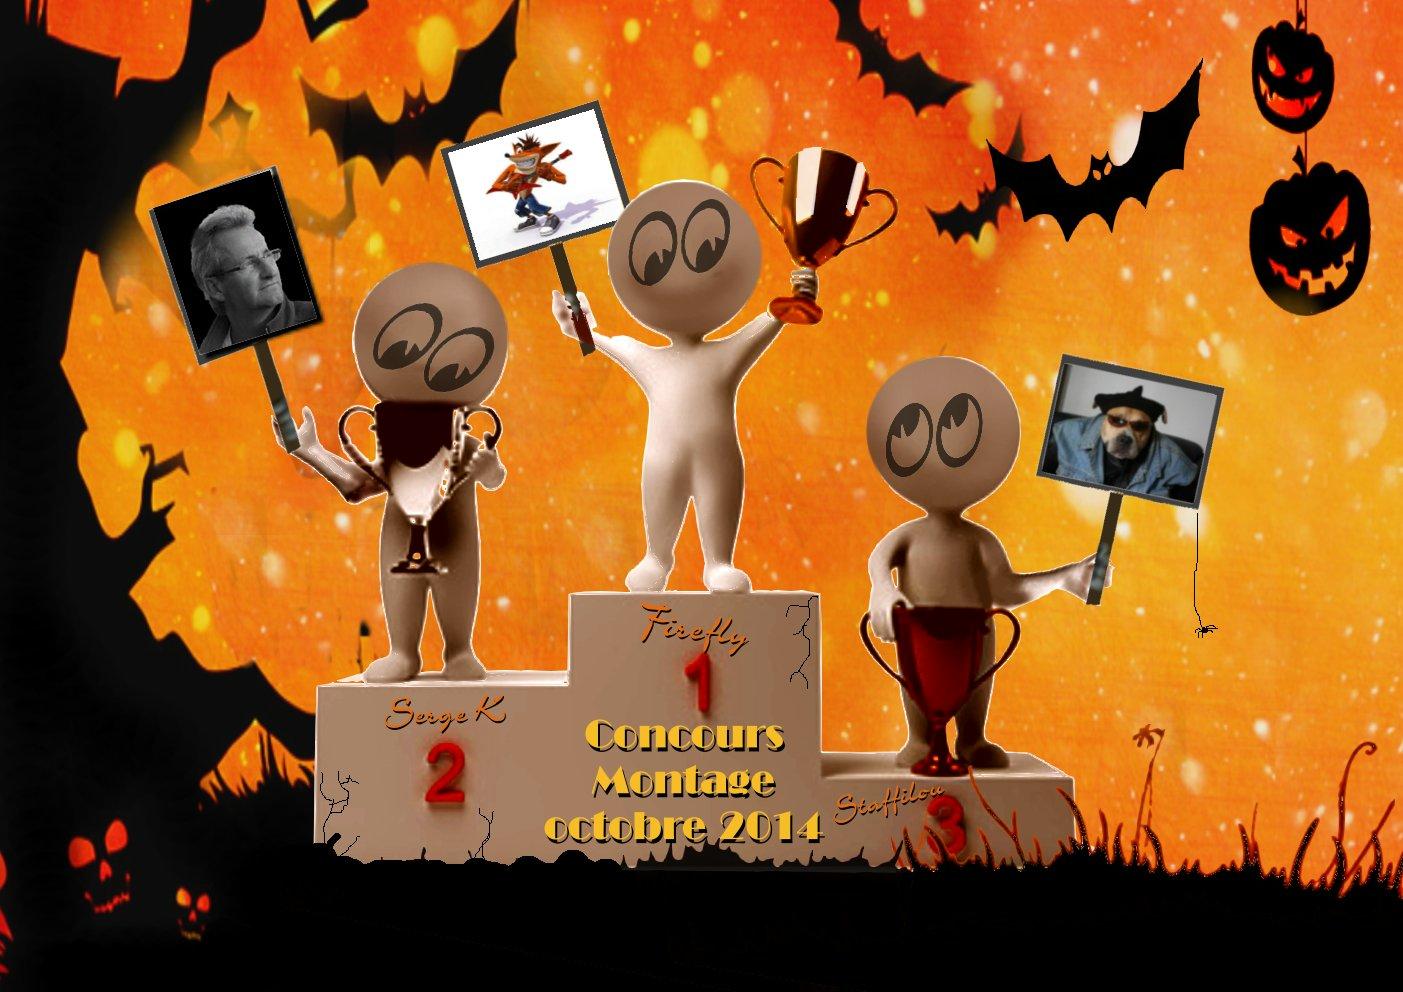 Concours montage d'octobre 2014  (La METEO) (terminé) 623401podiumoctobre14